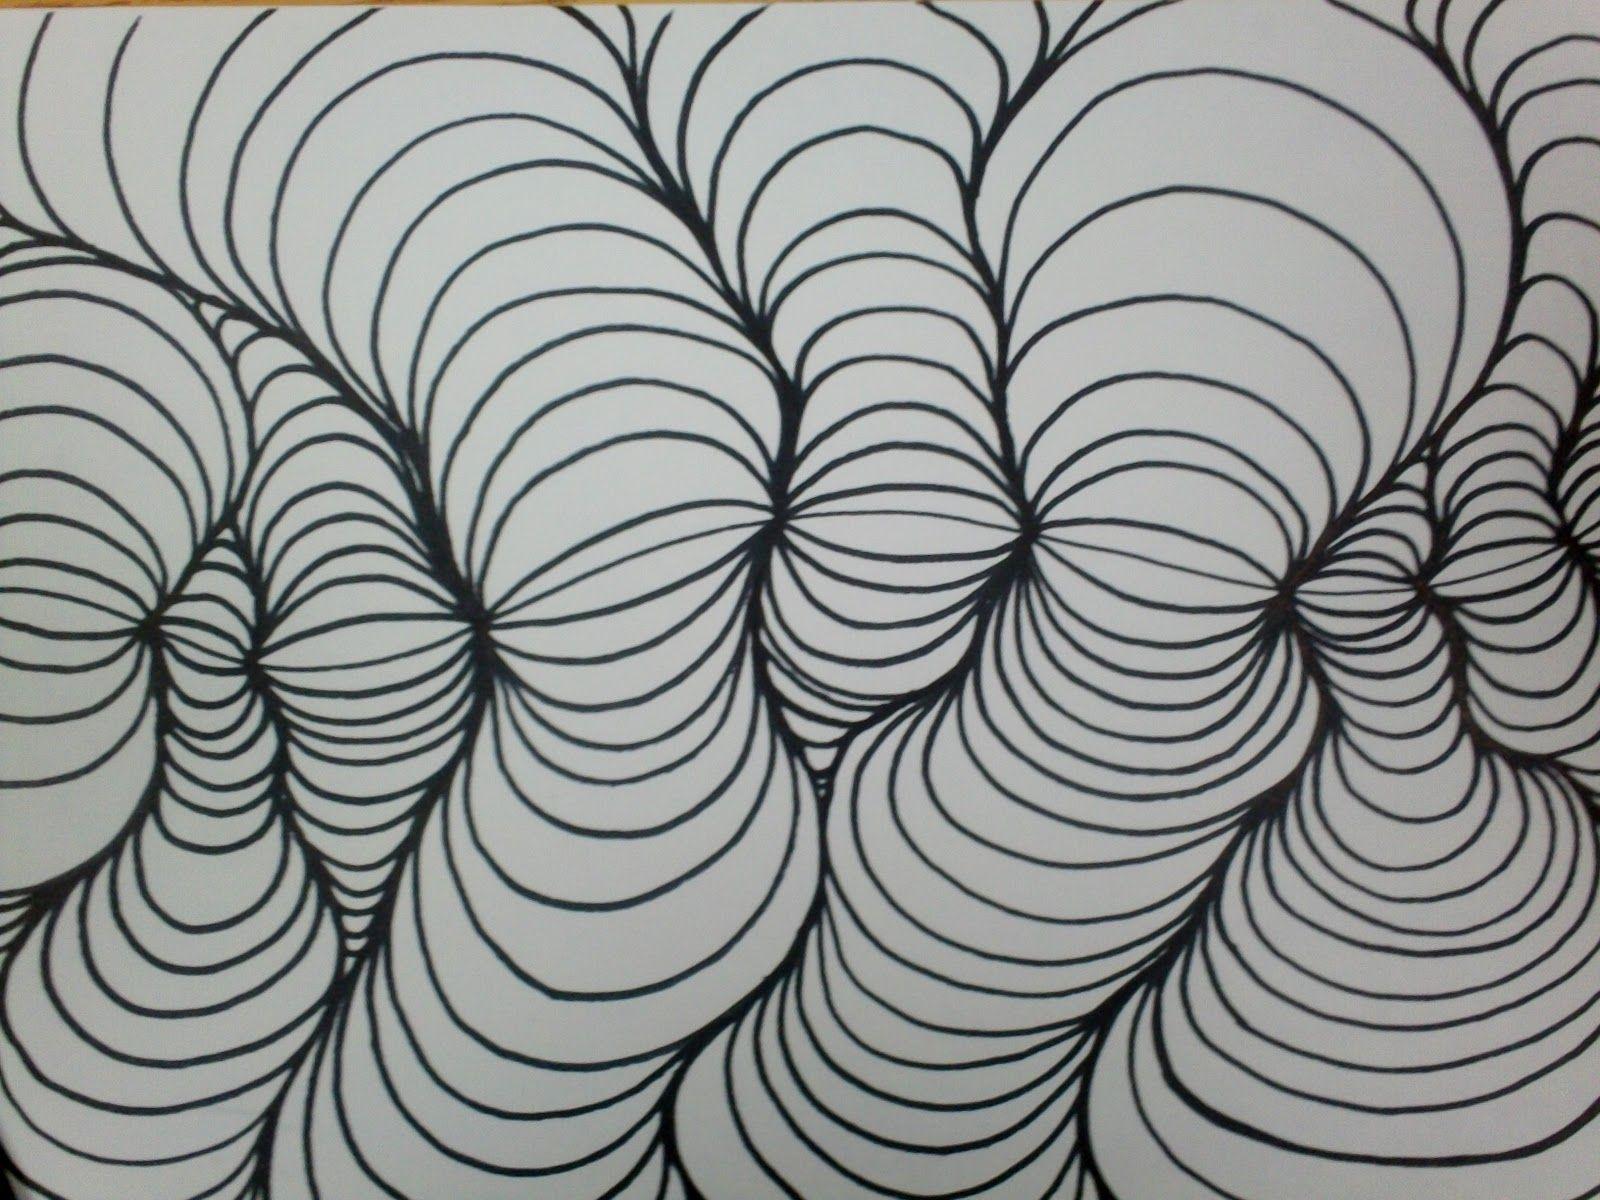 design patterns explained simply epub